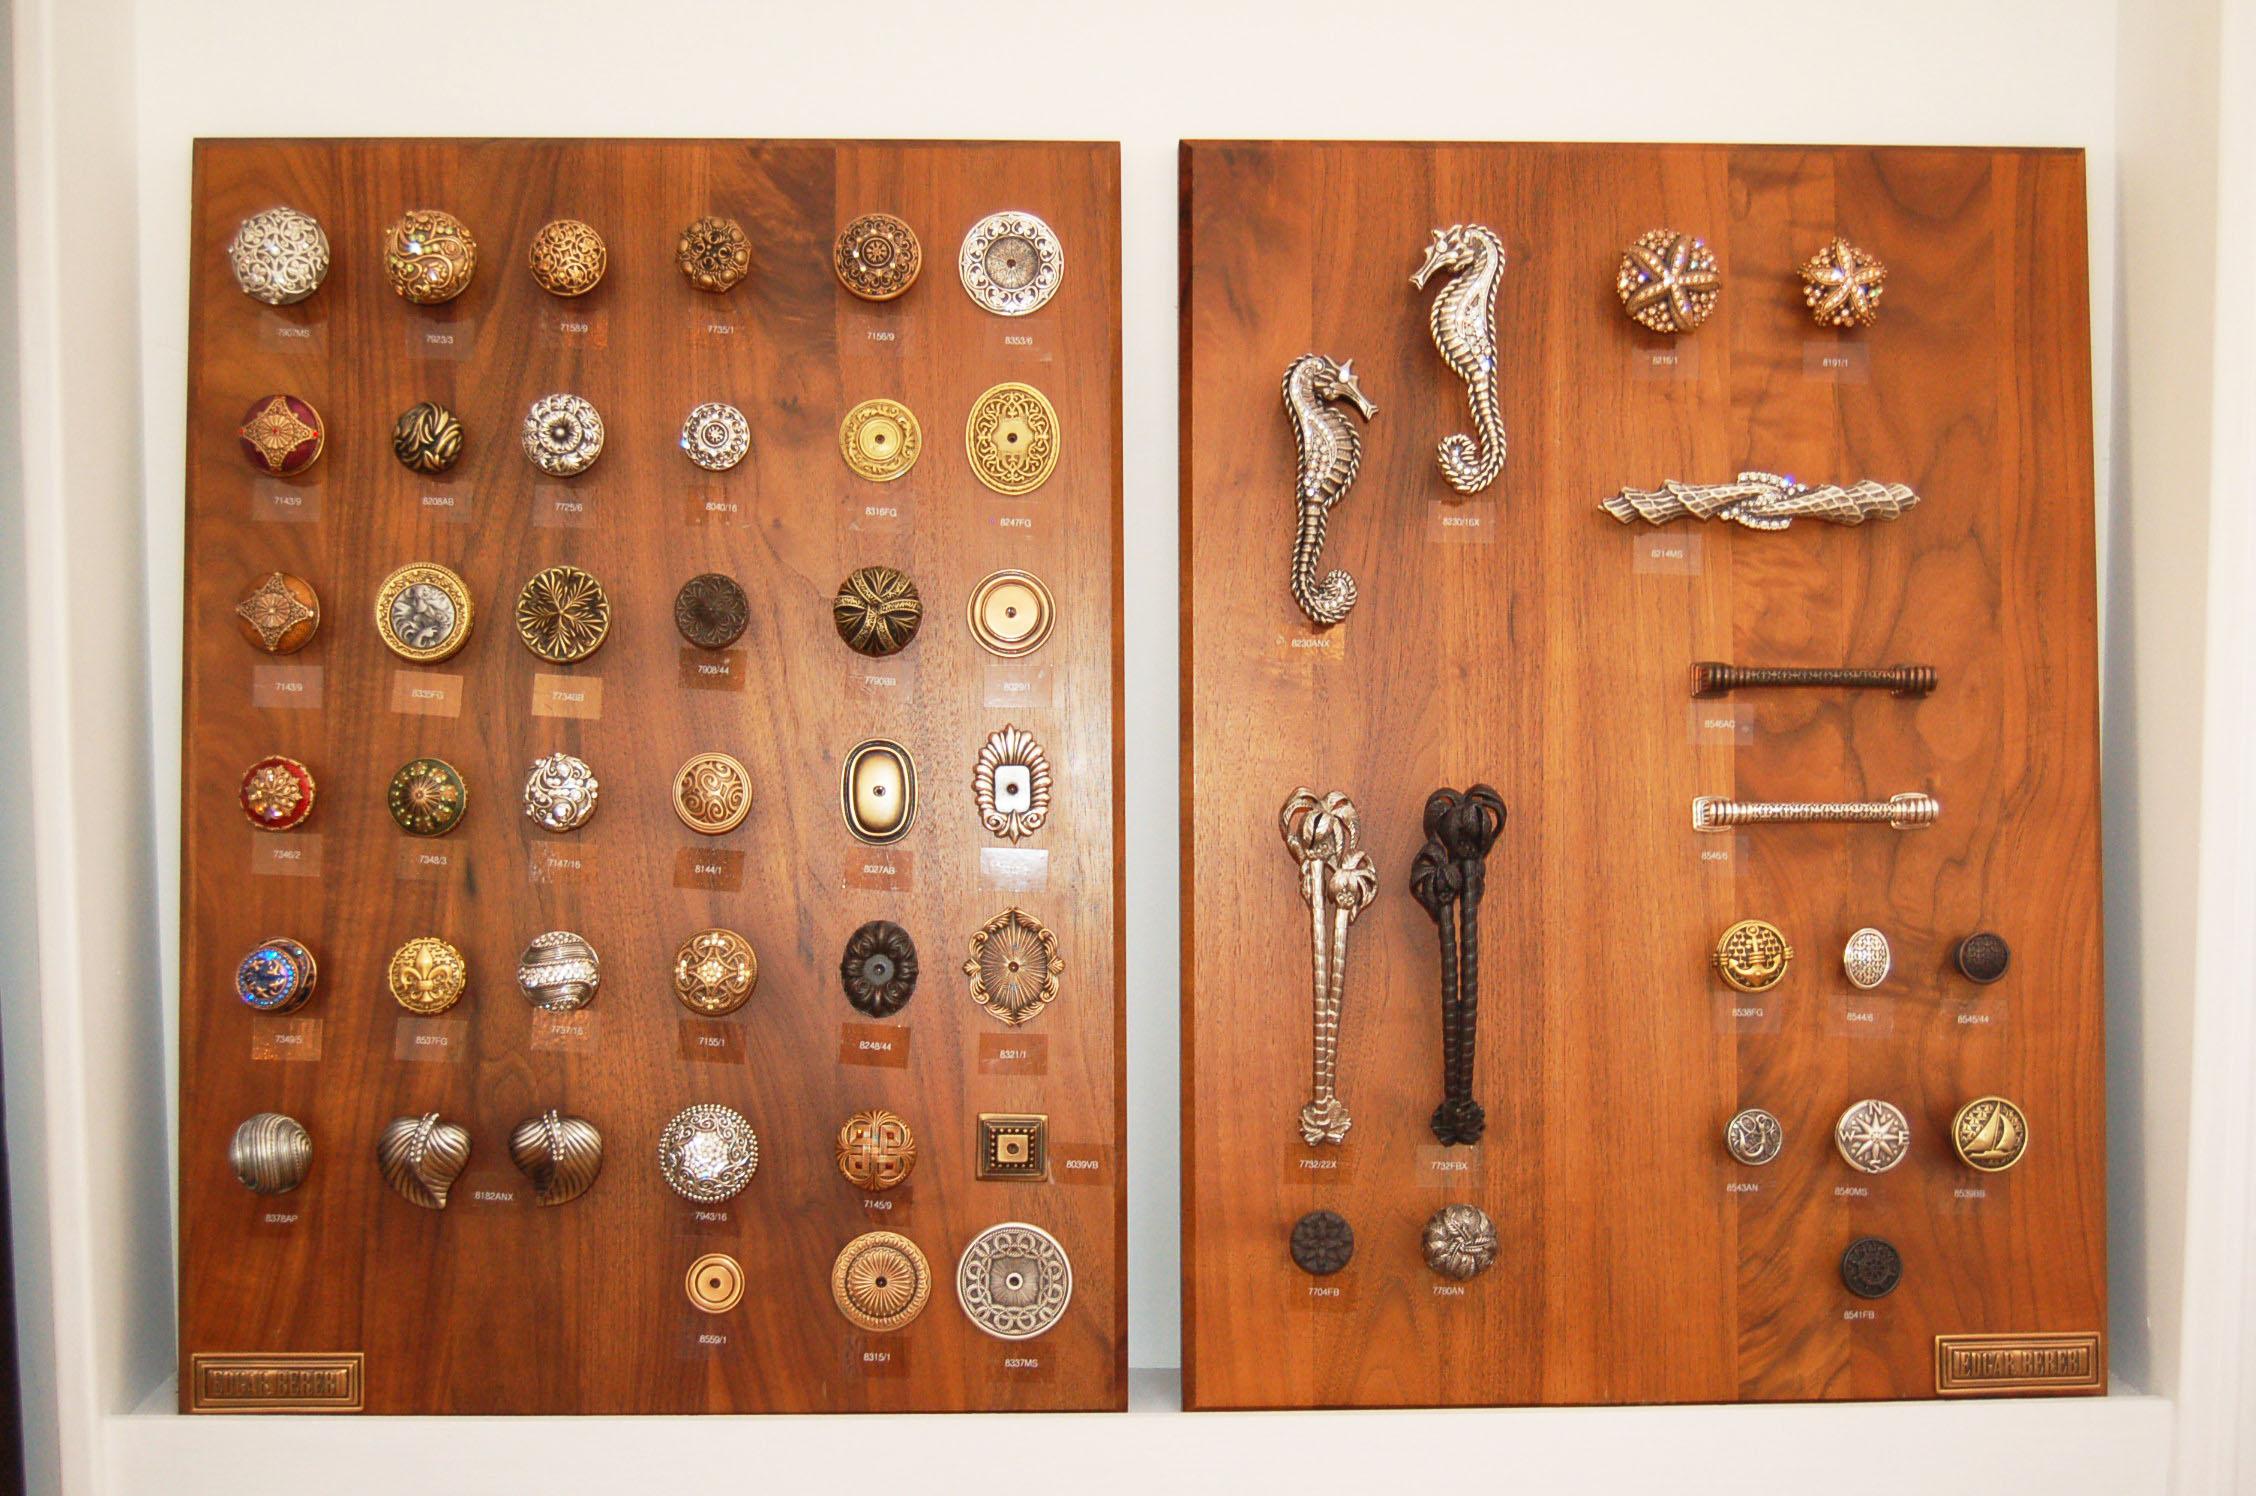 Dazzling knobs and hardware by Edgar Berebi